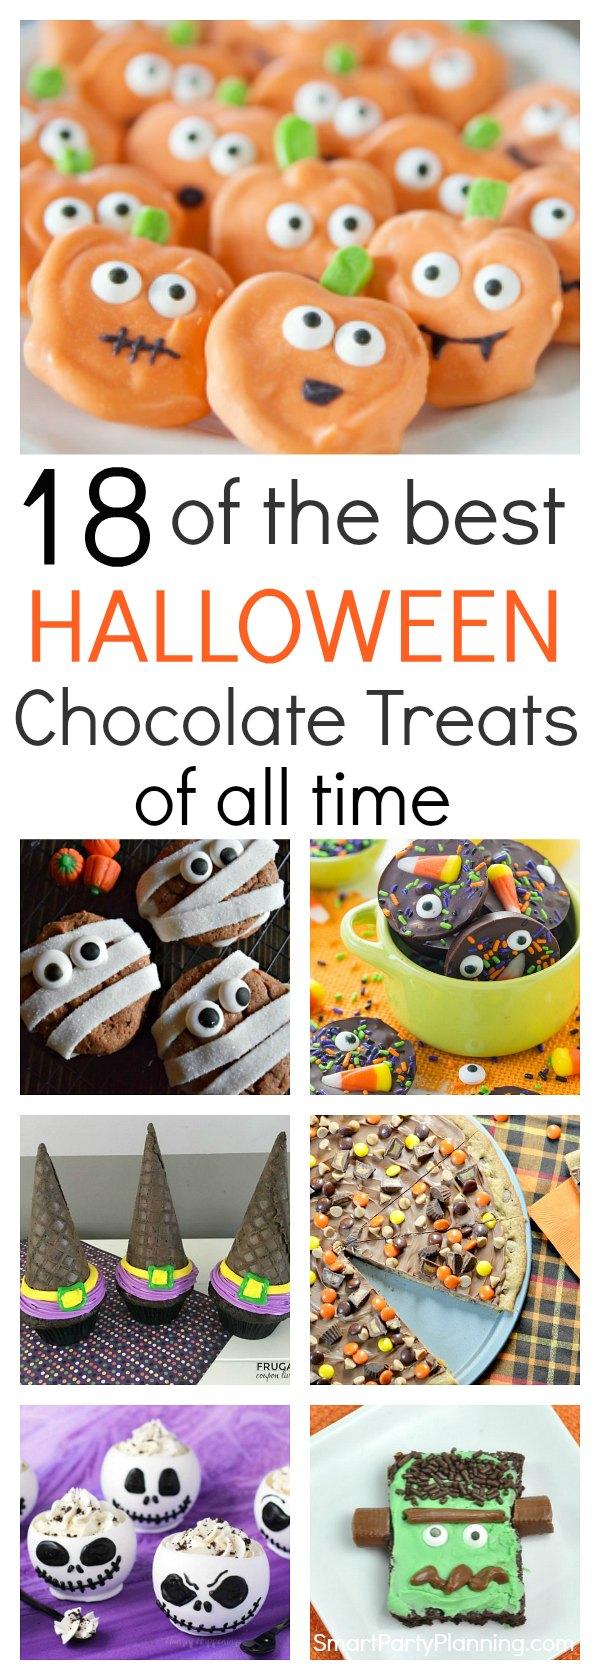 Halloween Chocolate Treats